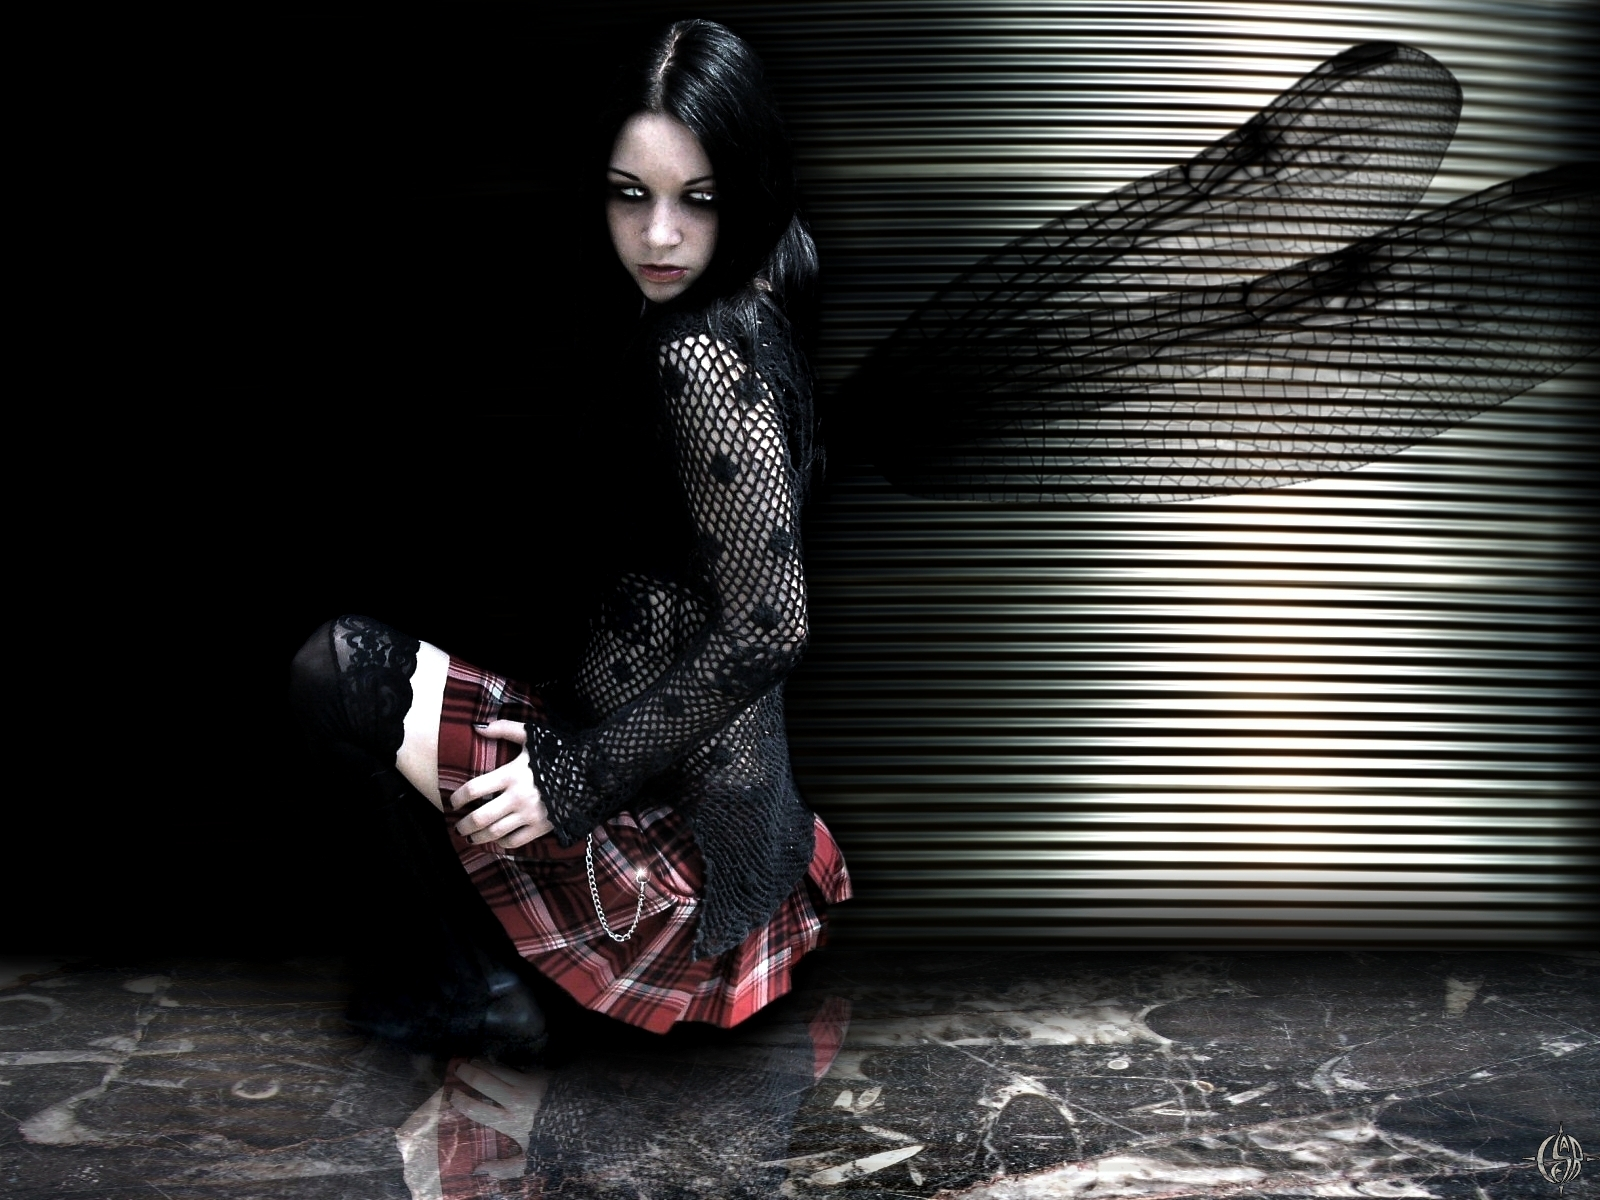 sexy gothic fairy wallpaper - photo #15